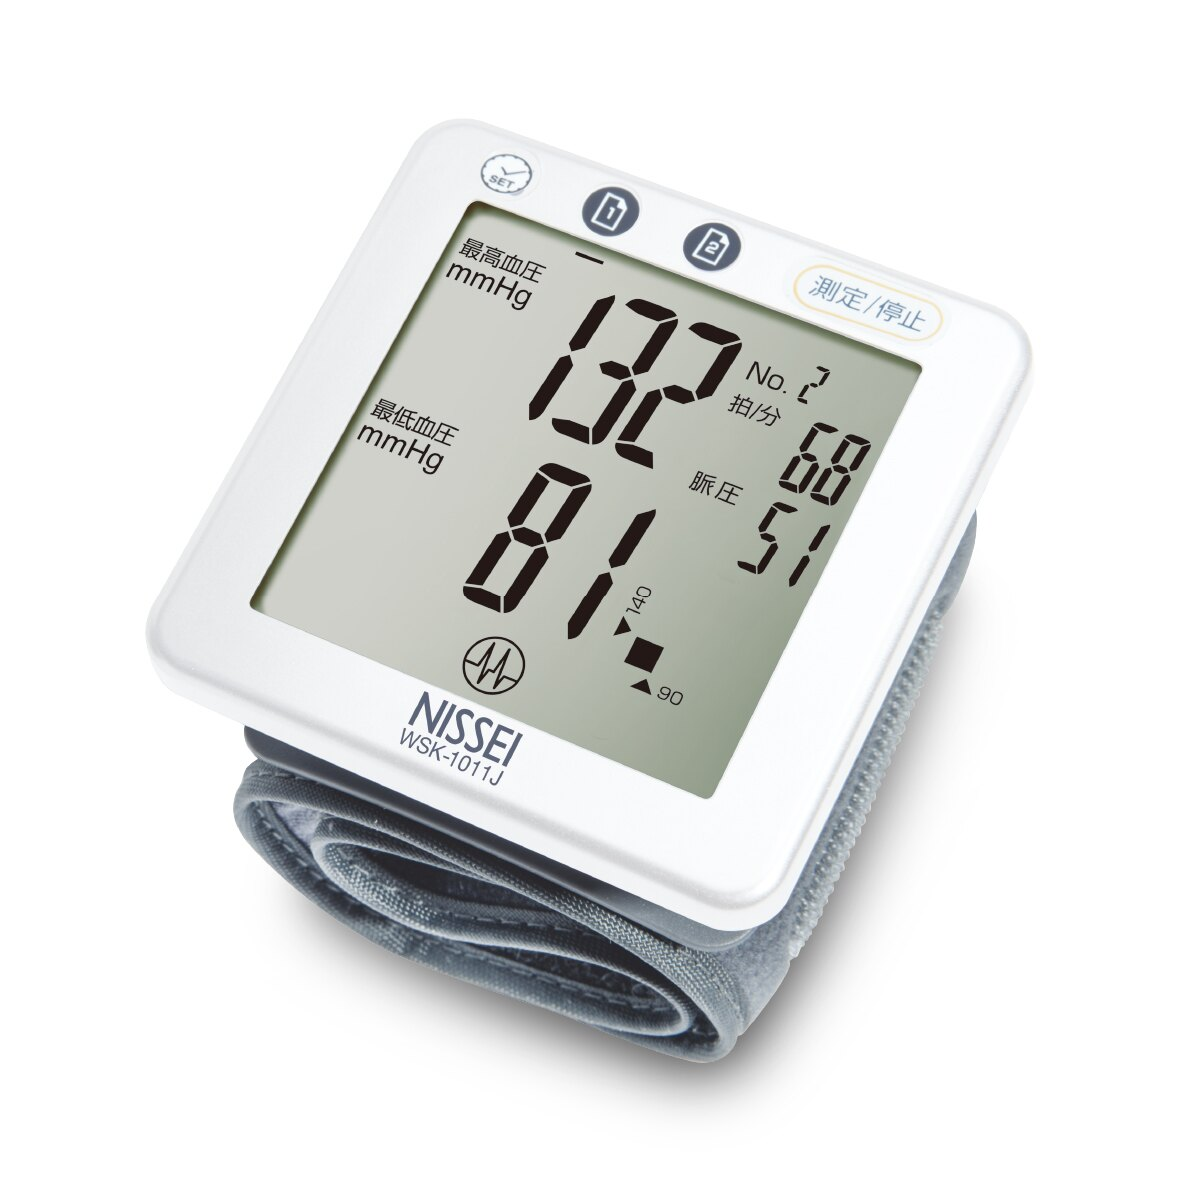 "NISSEI""日本精密""手腕式血壓計- WSK-1011J,登錄五年保固"